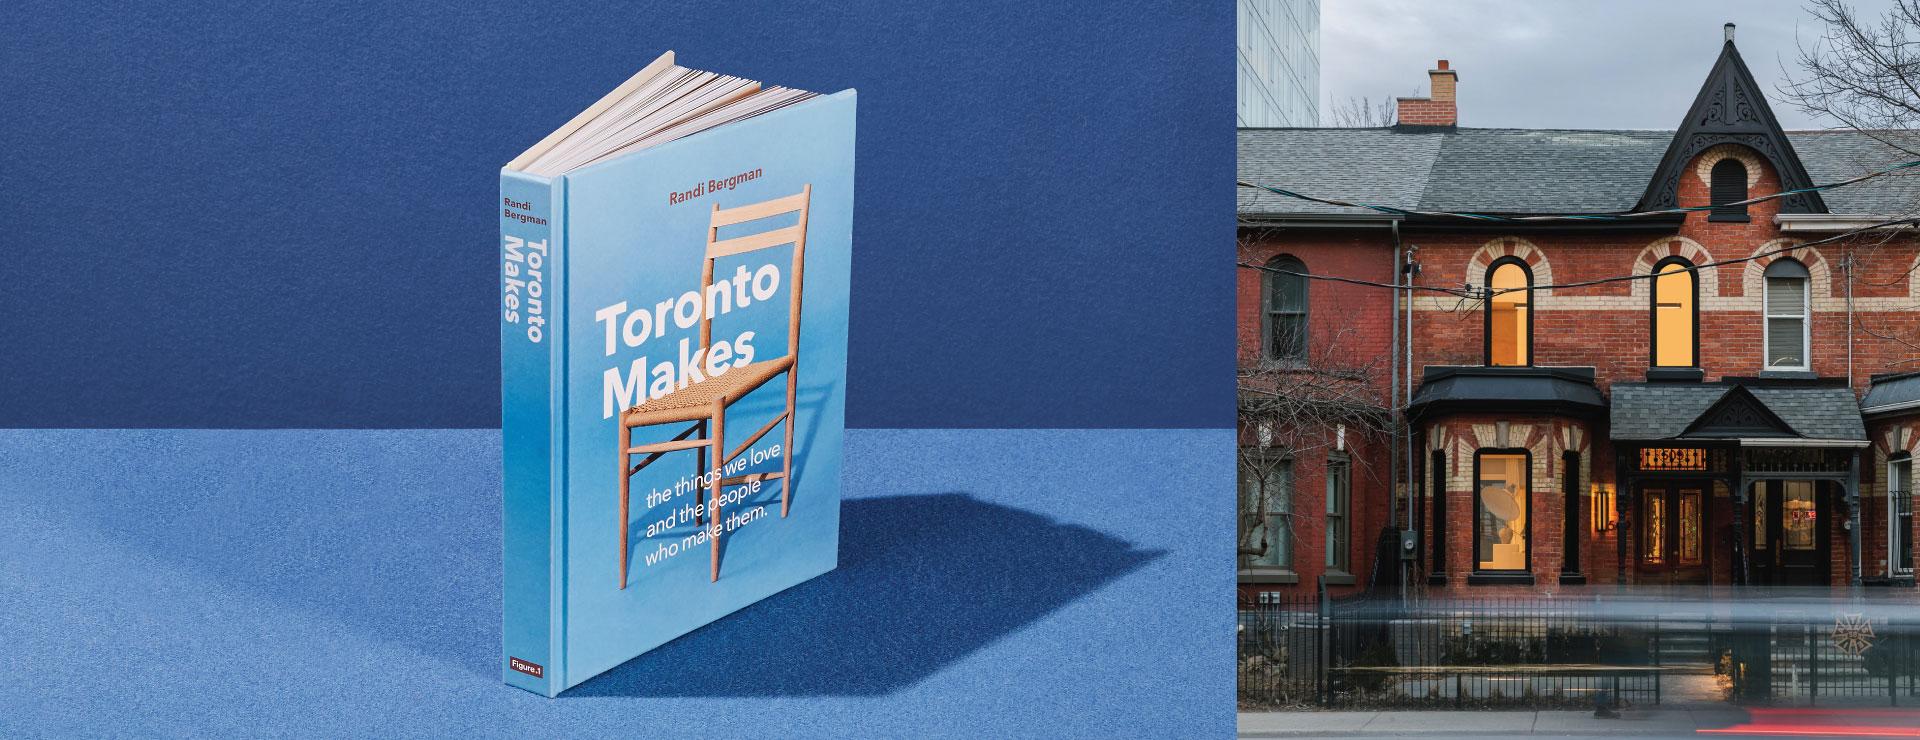 Toronto Makes House – CANCELLED